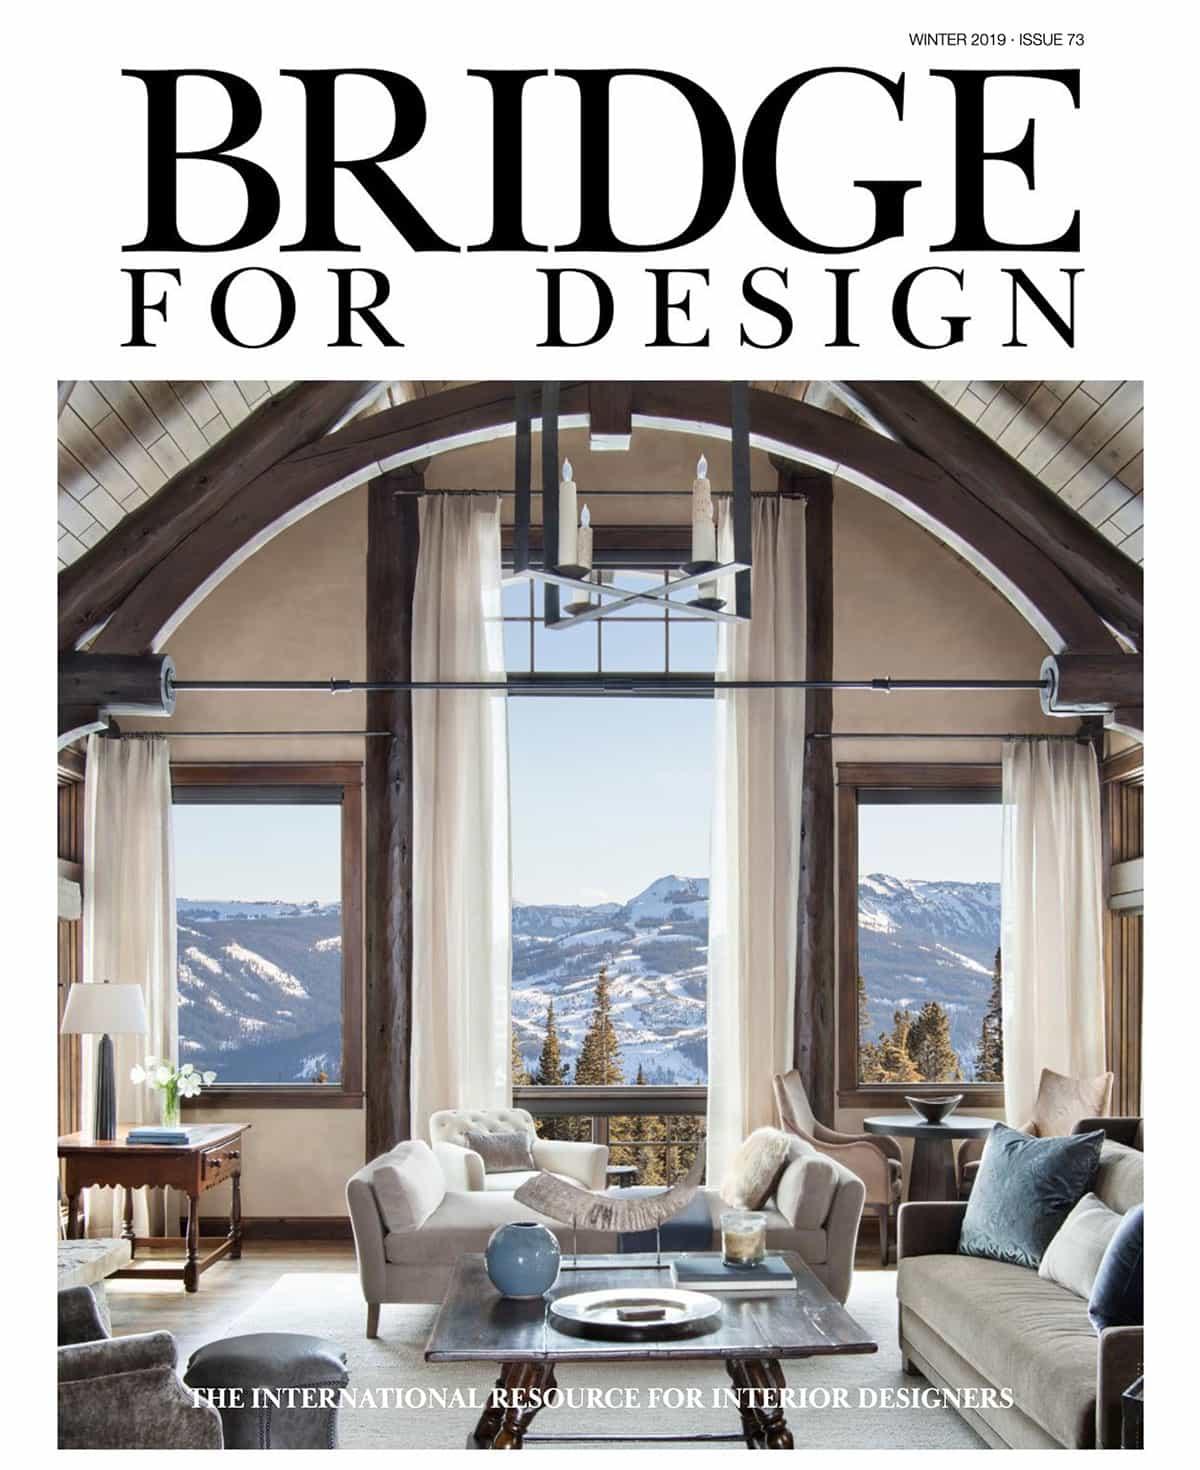 Bridge for Design JS 1 1